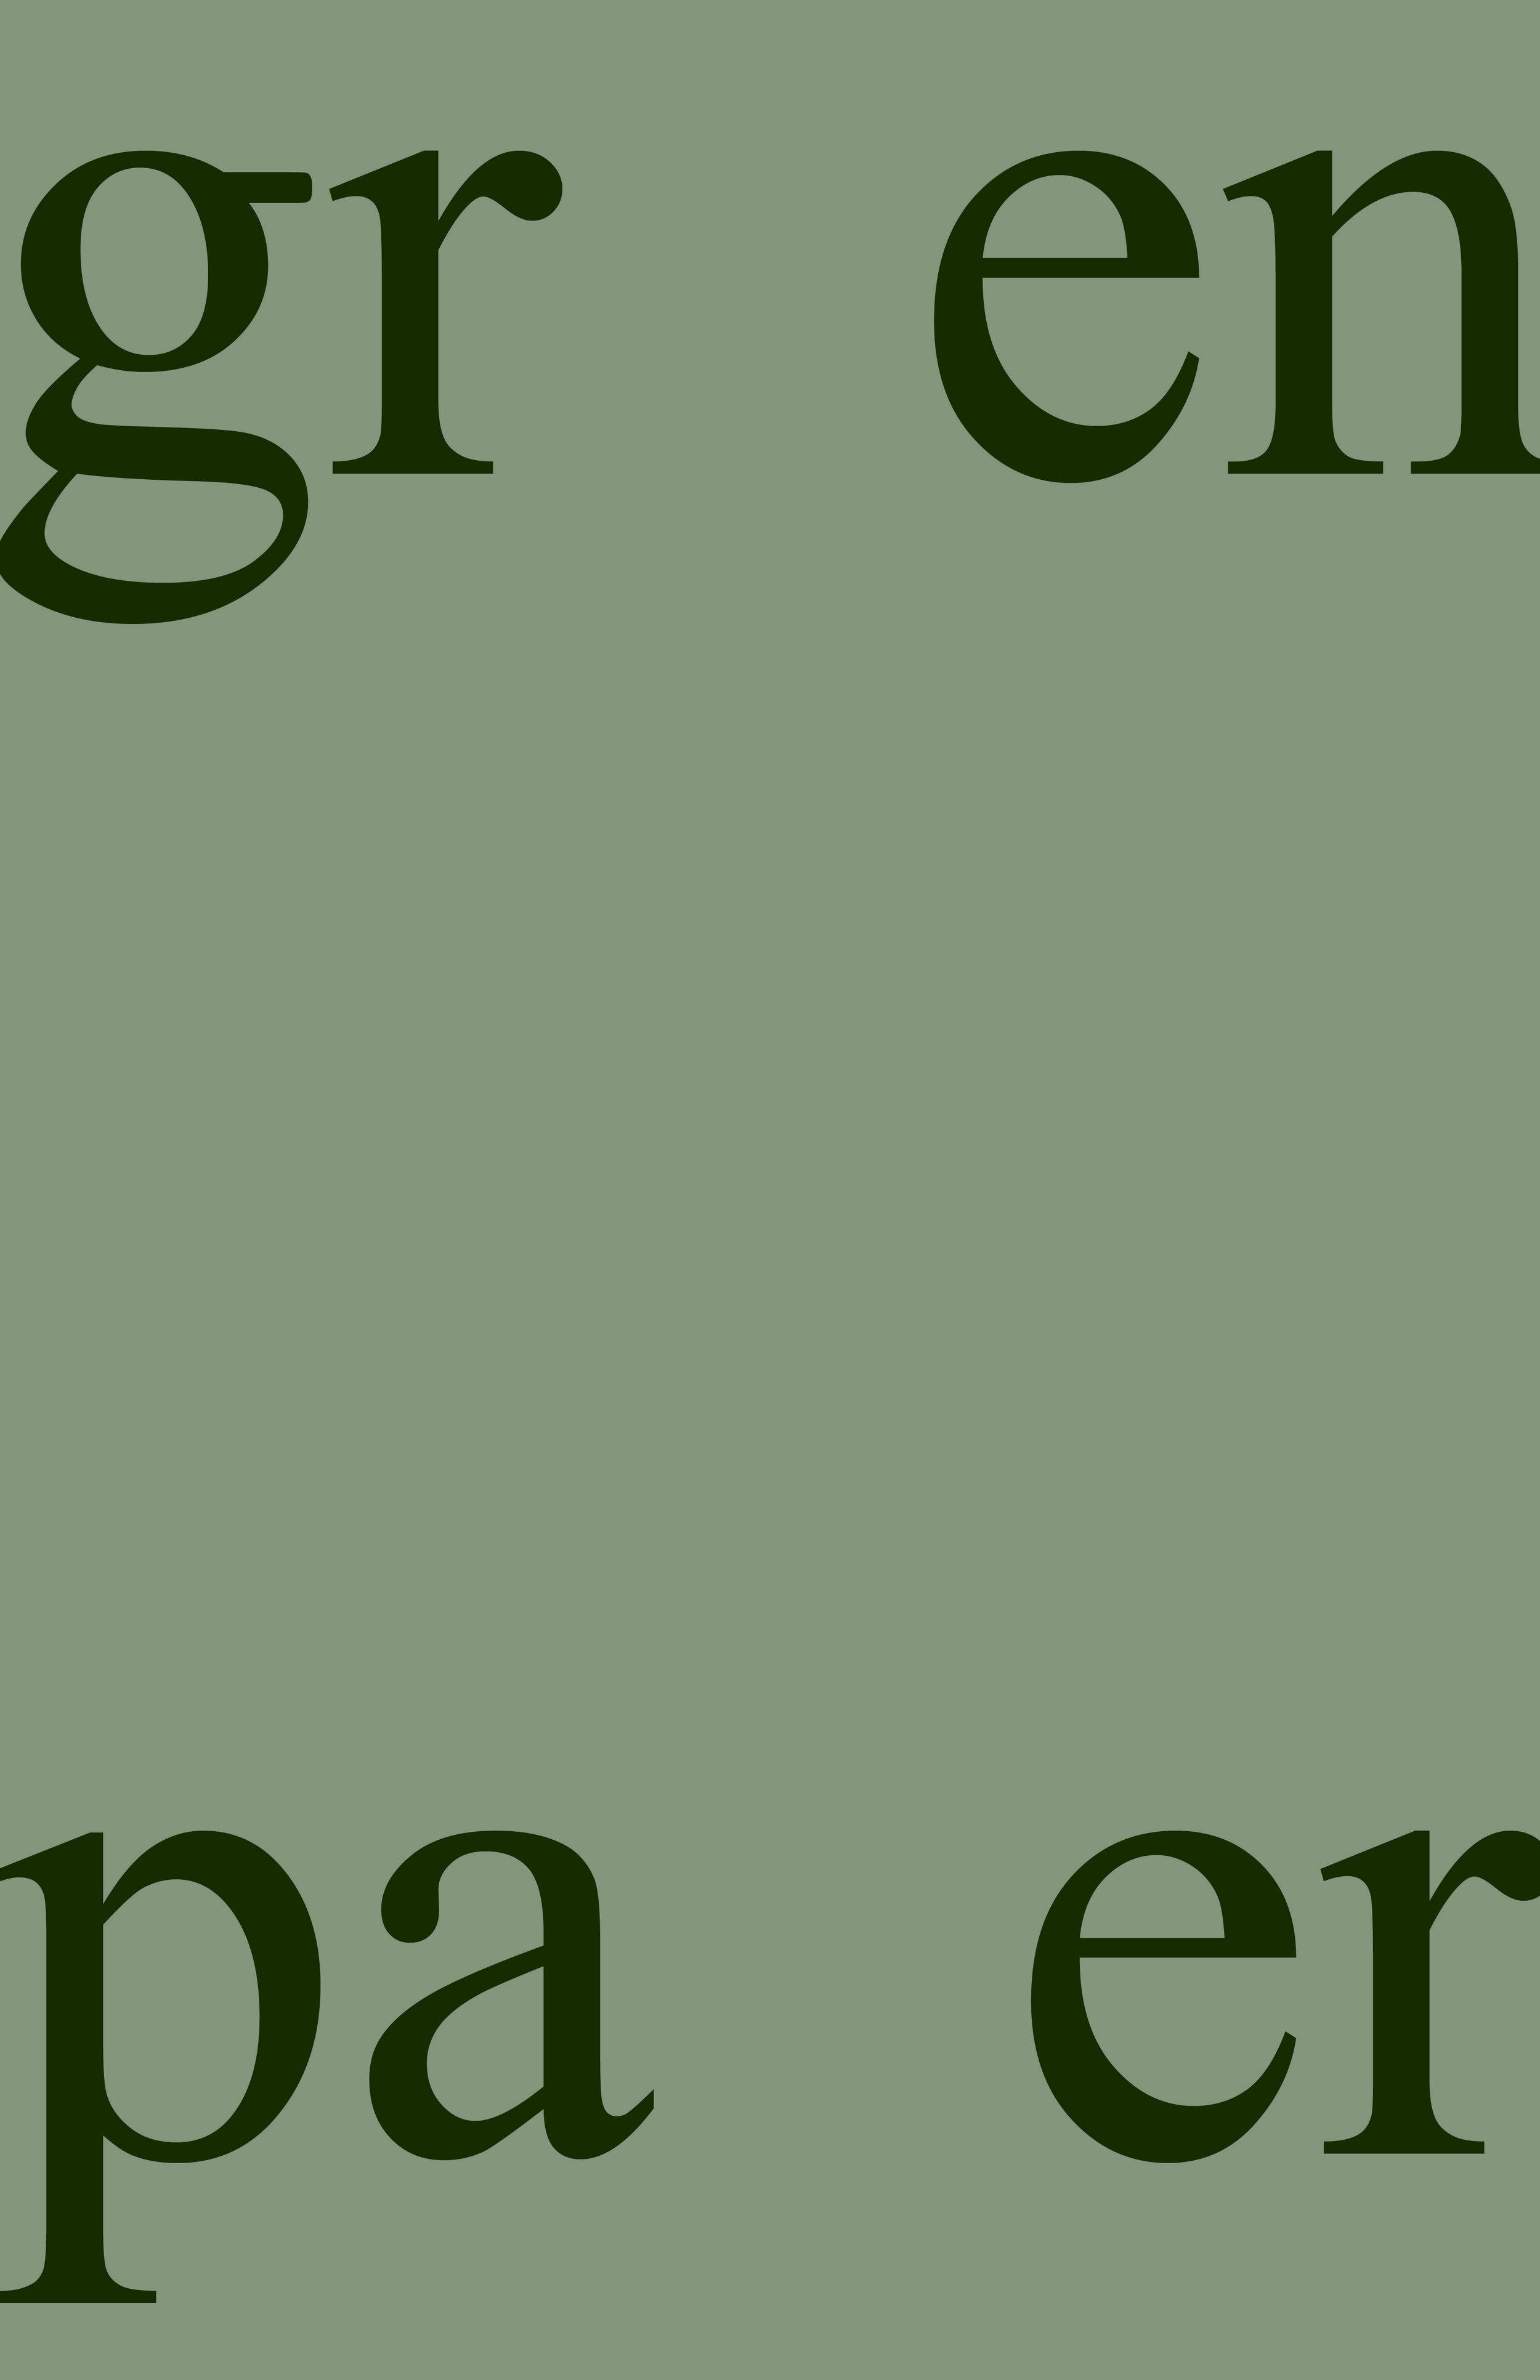 green paper 2.jpg